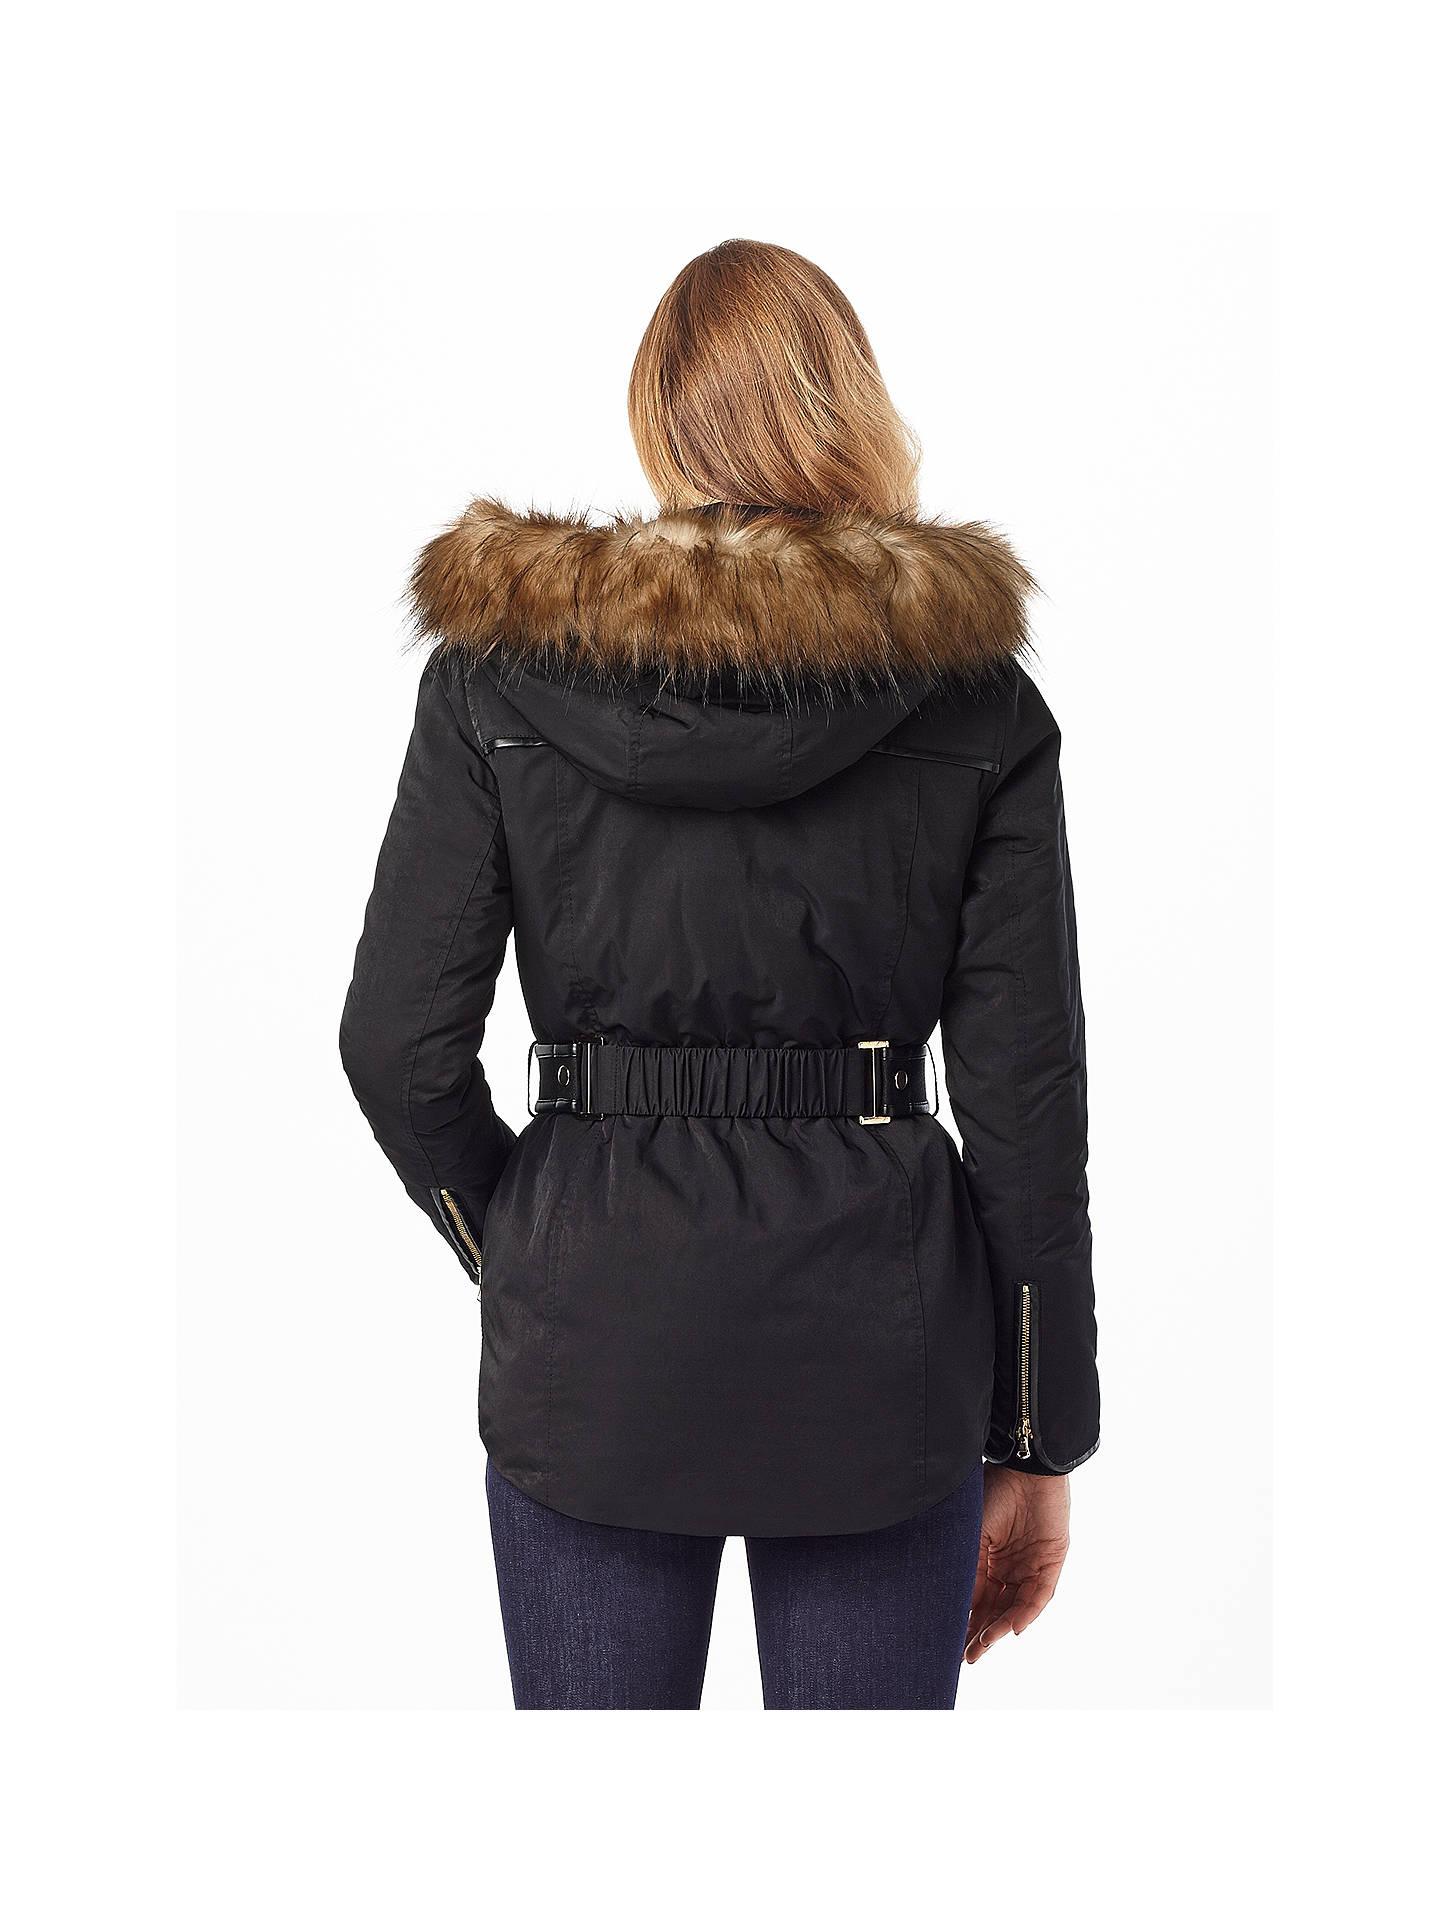 Phase Eight Alanis Puffer Jacket Black At John Lewis Partners